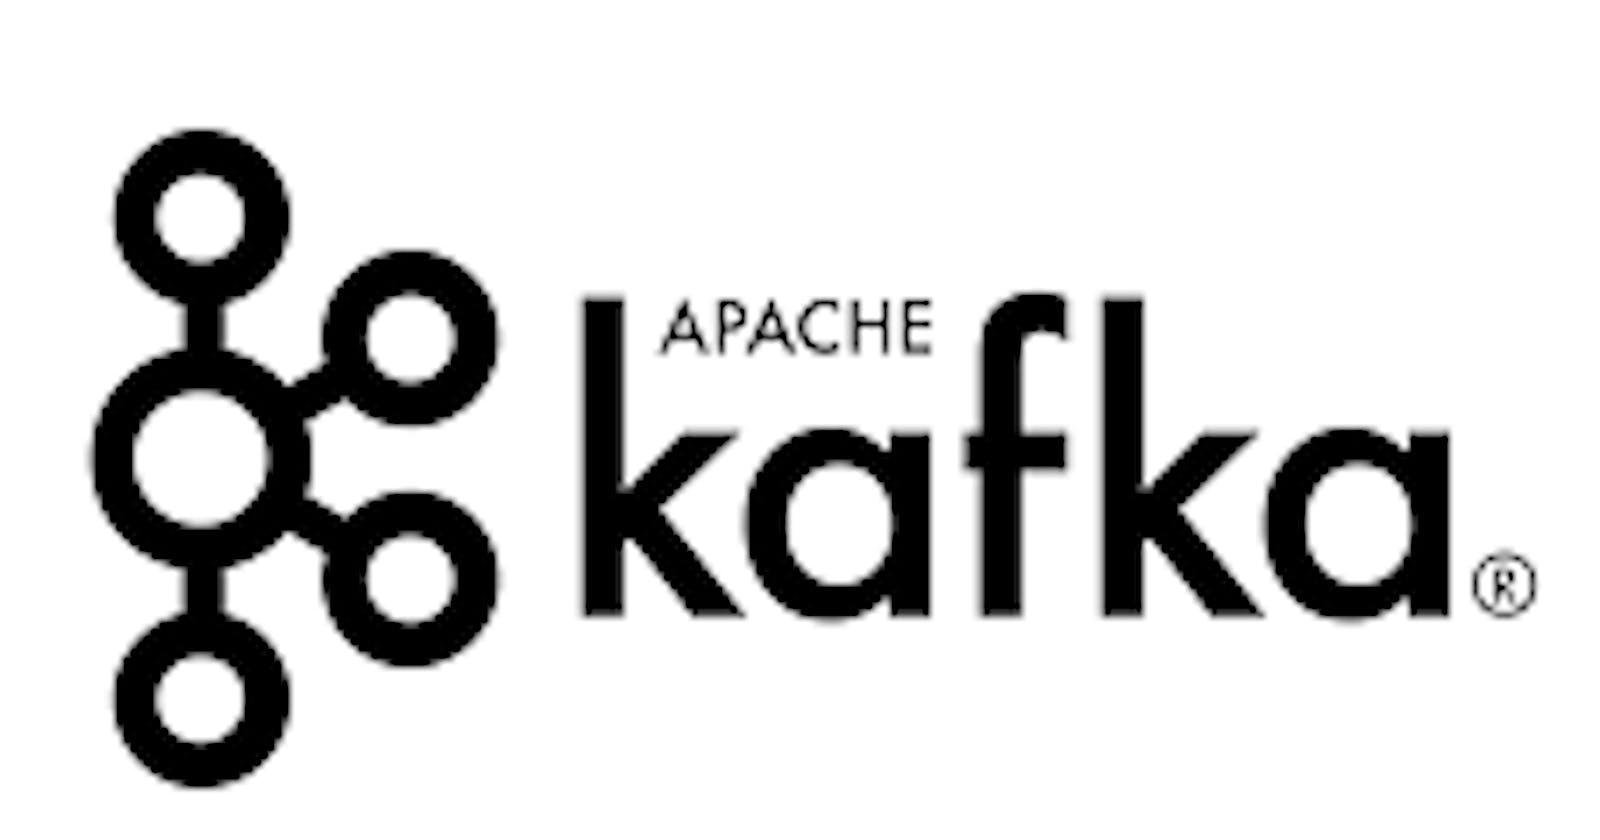 Beginners guide to Kafka